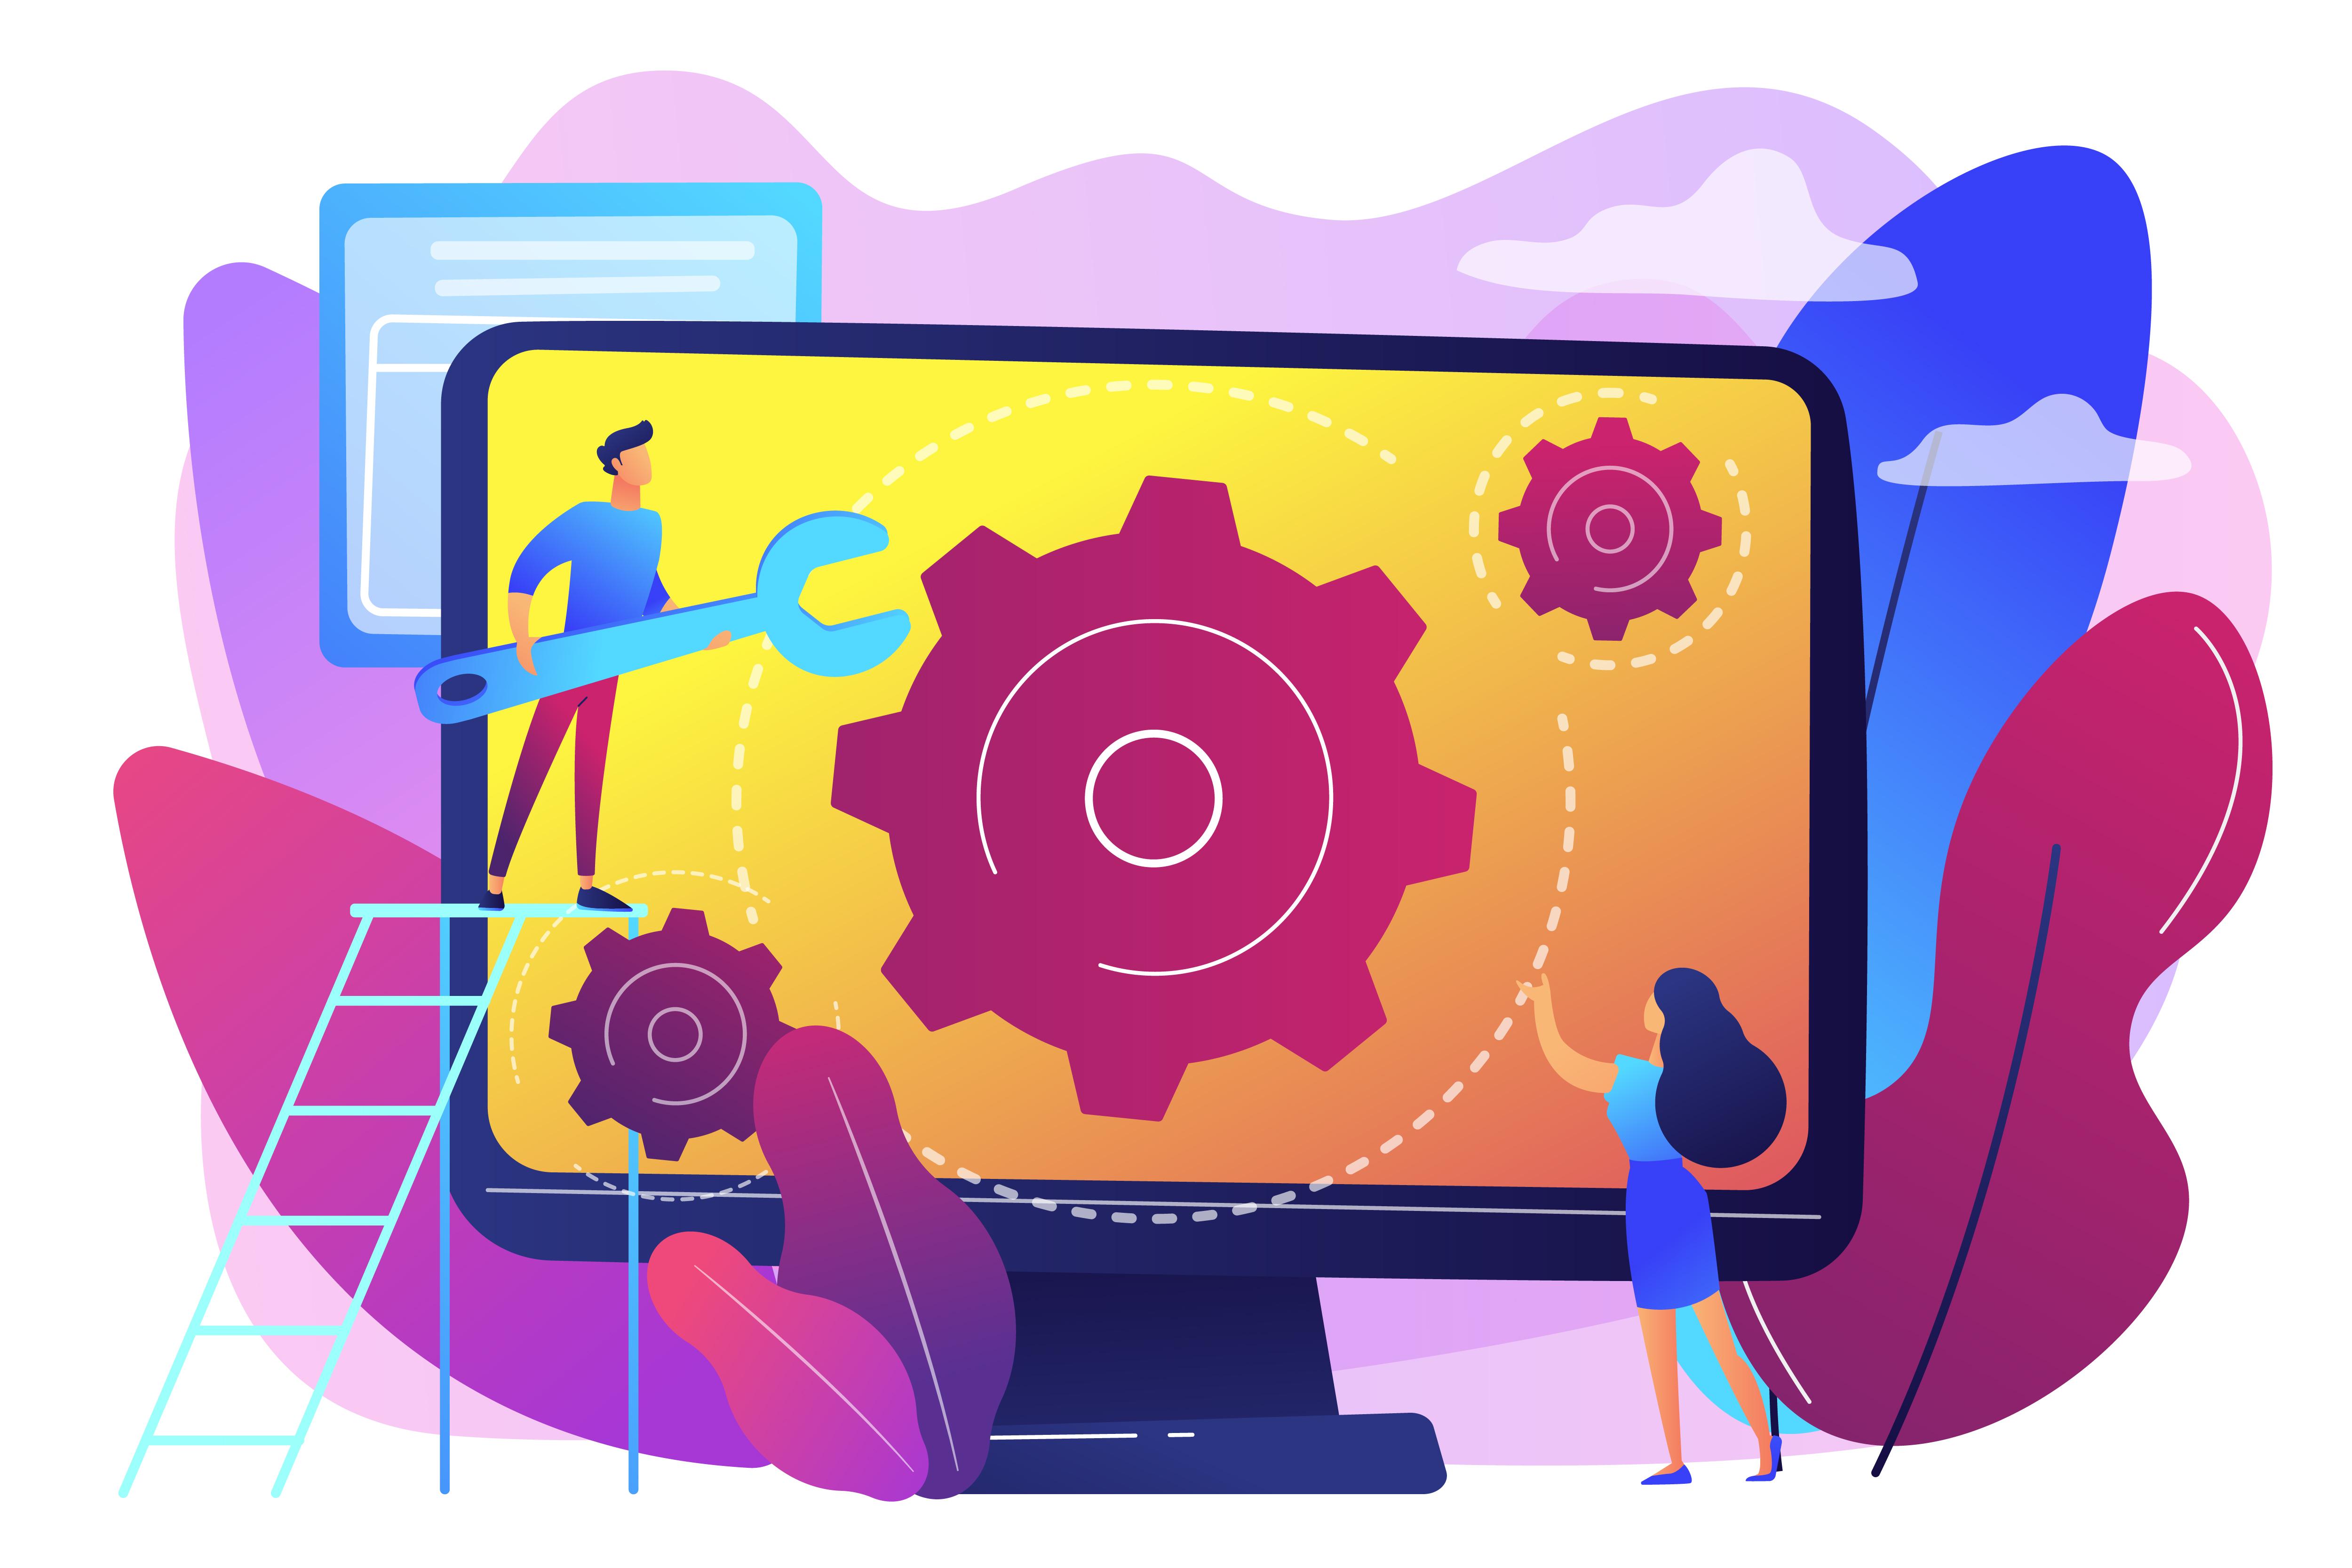 Computer service concept vector illustration.